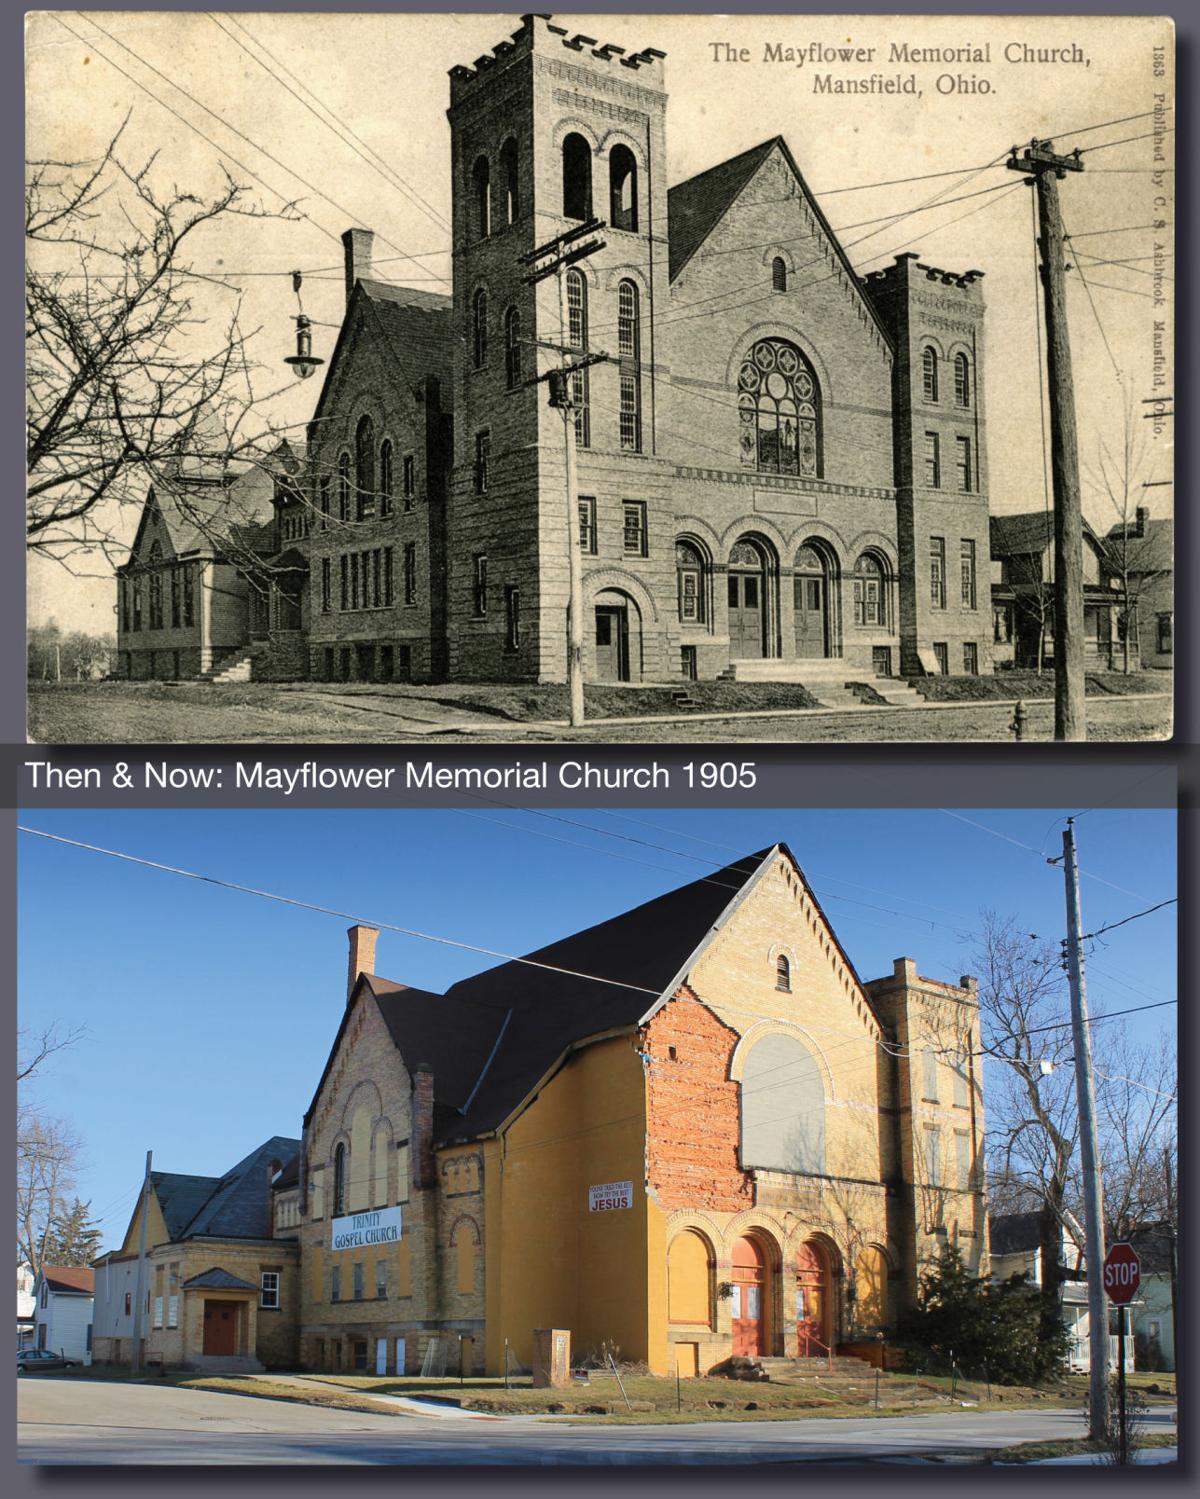 Then & Now: Mayflower Memorial